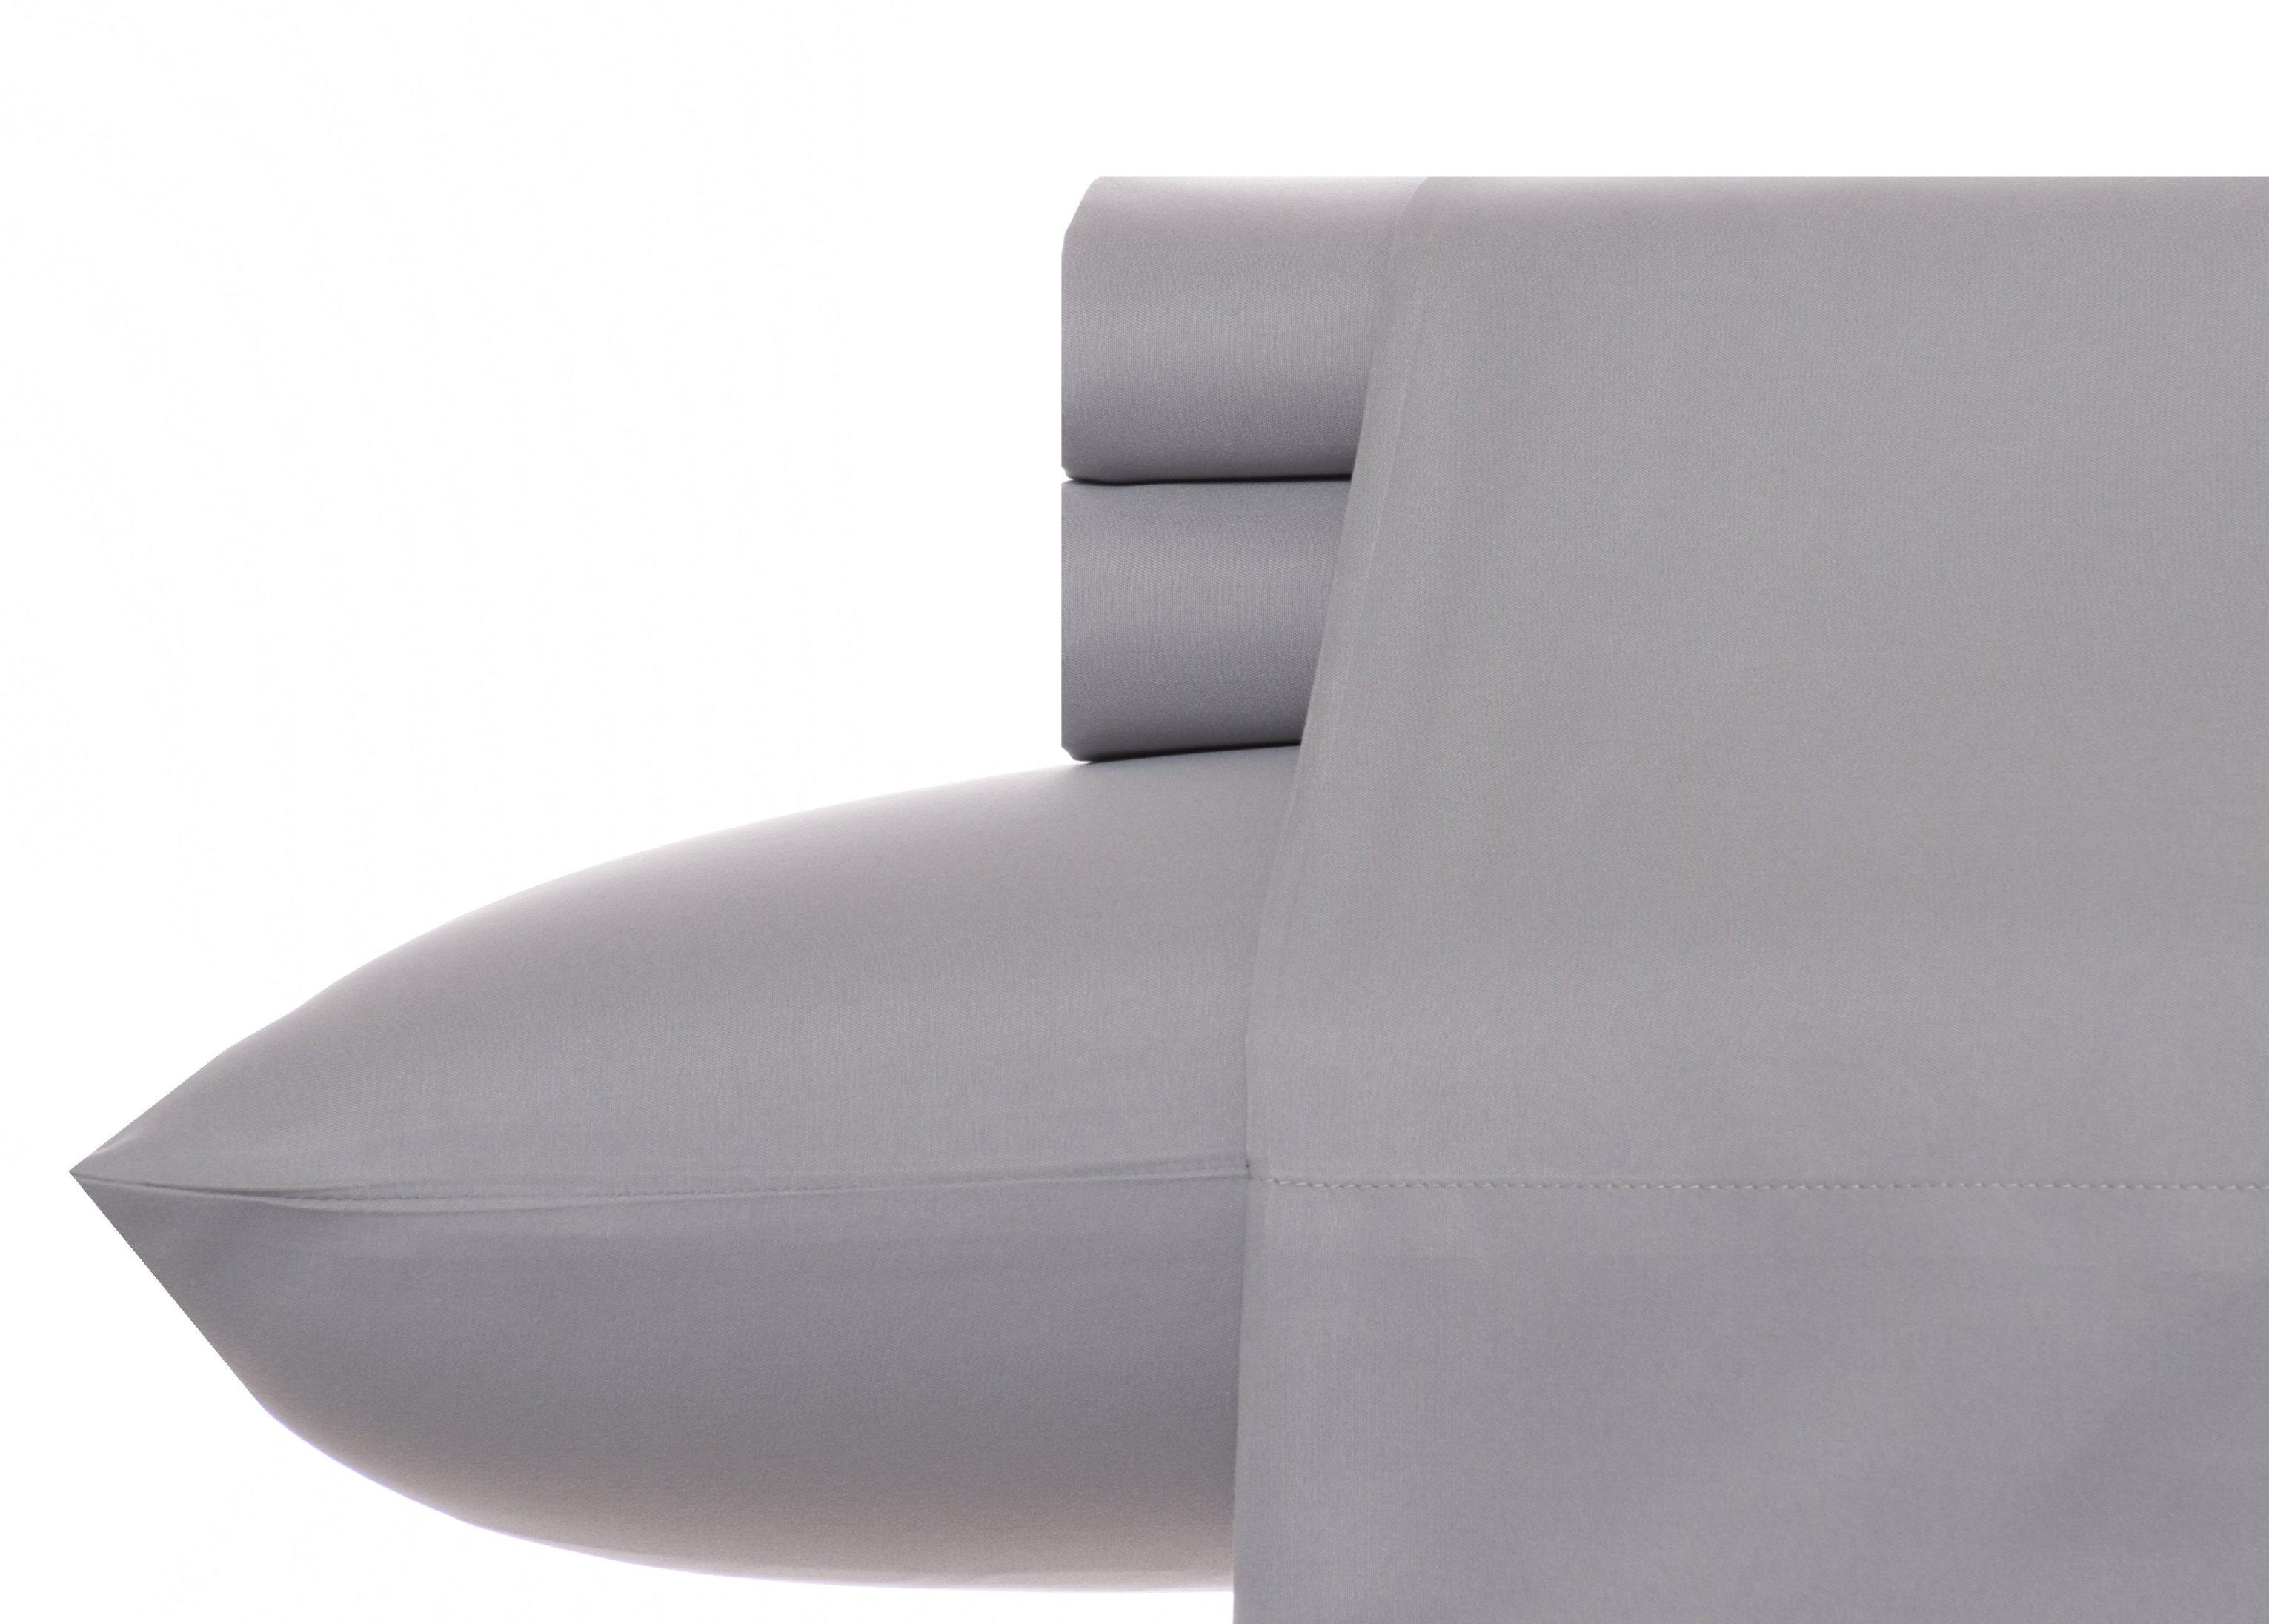 Bauer plantation chair - View Larger